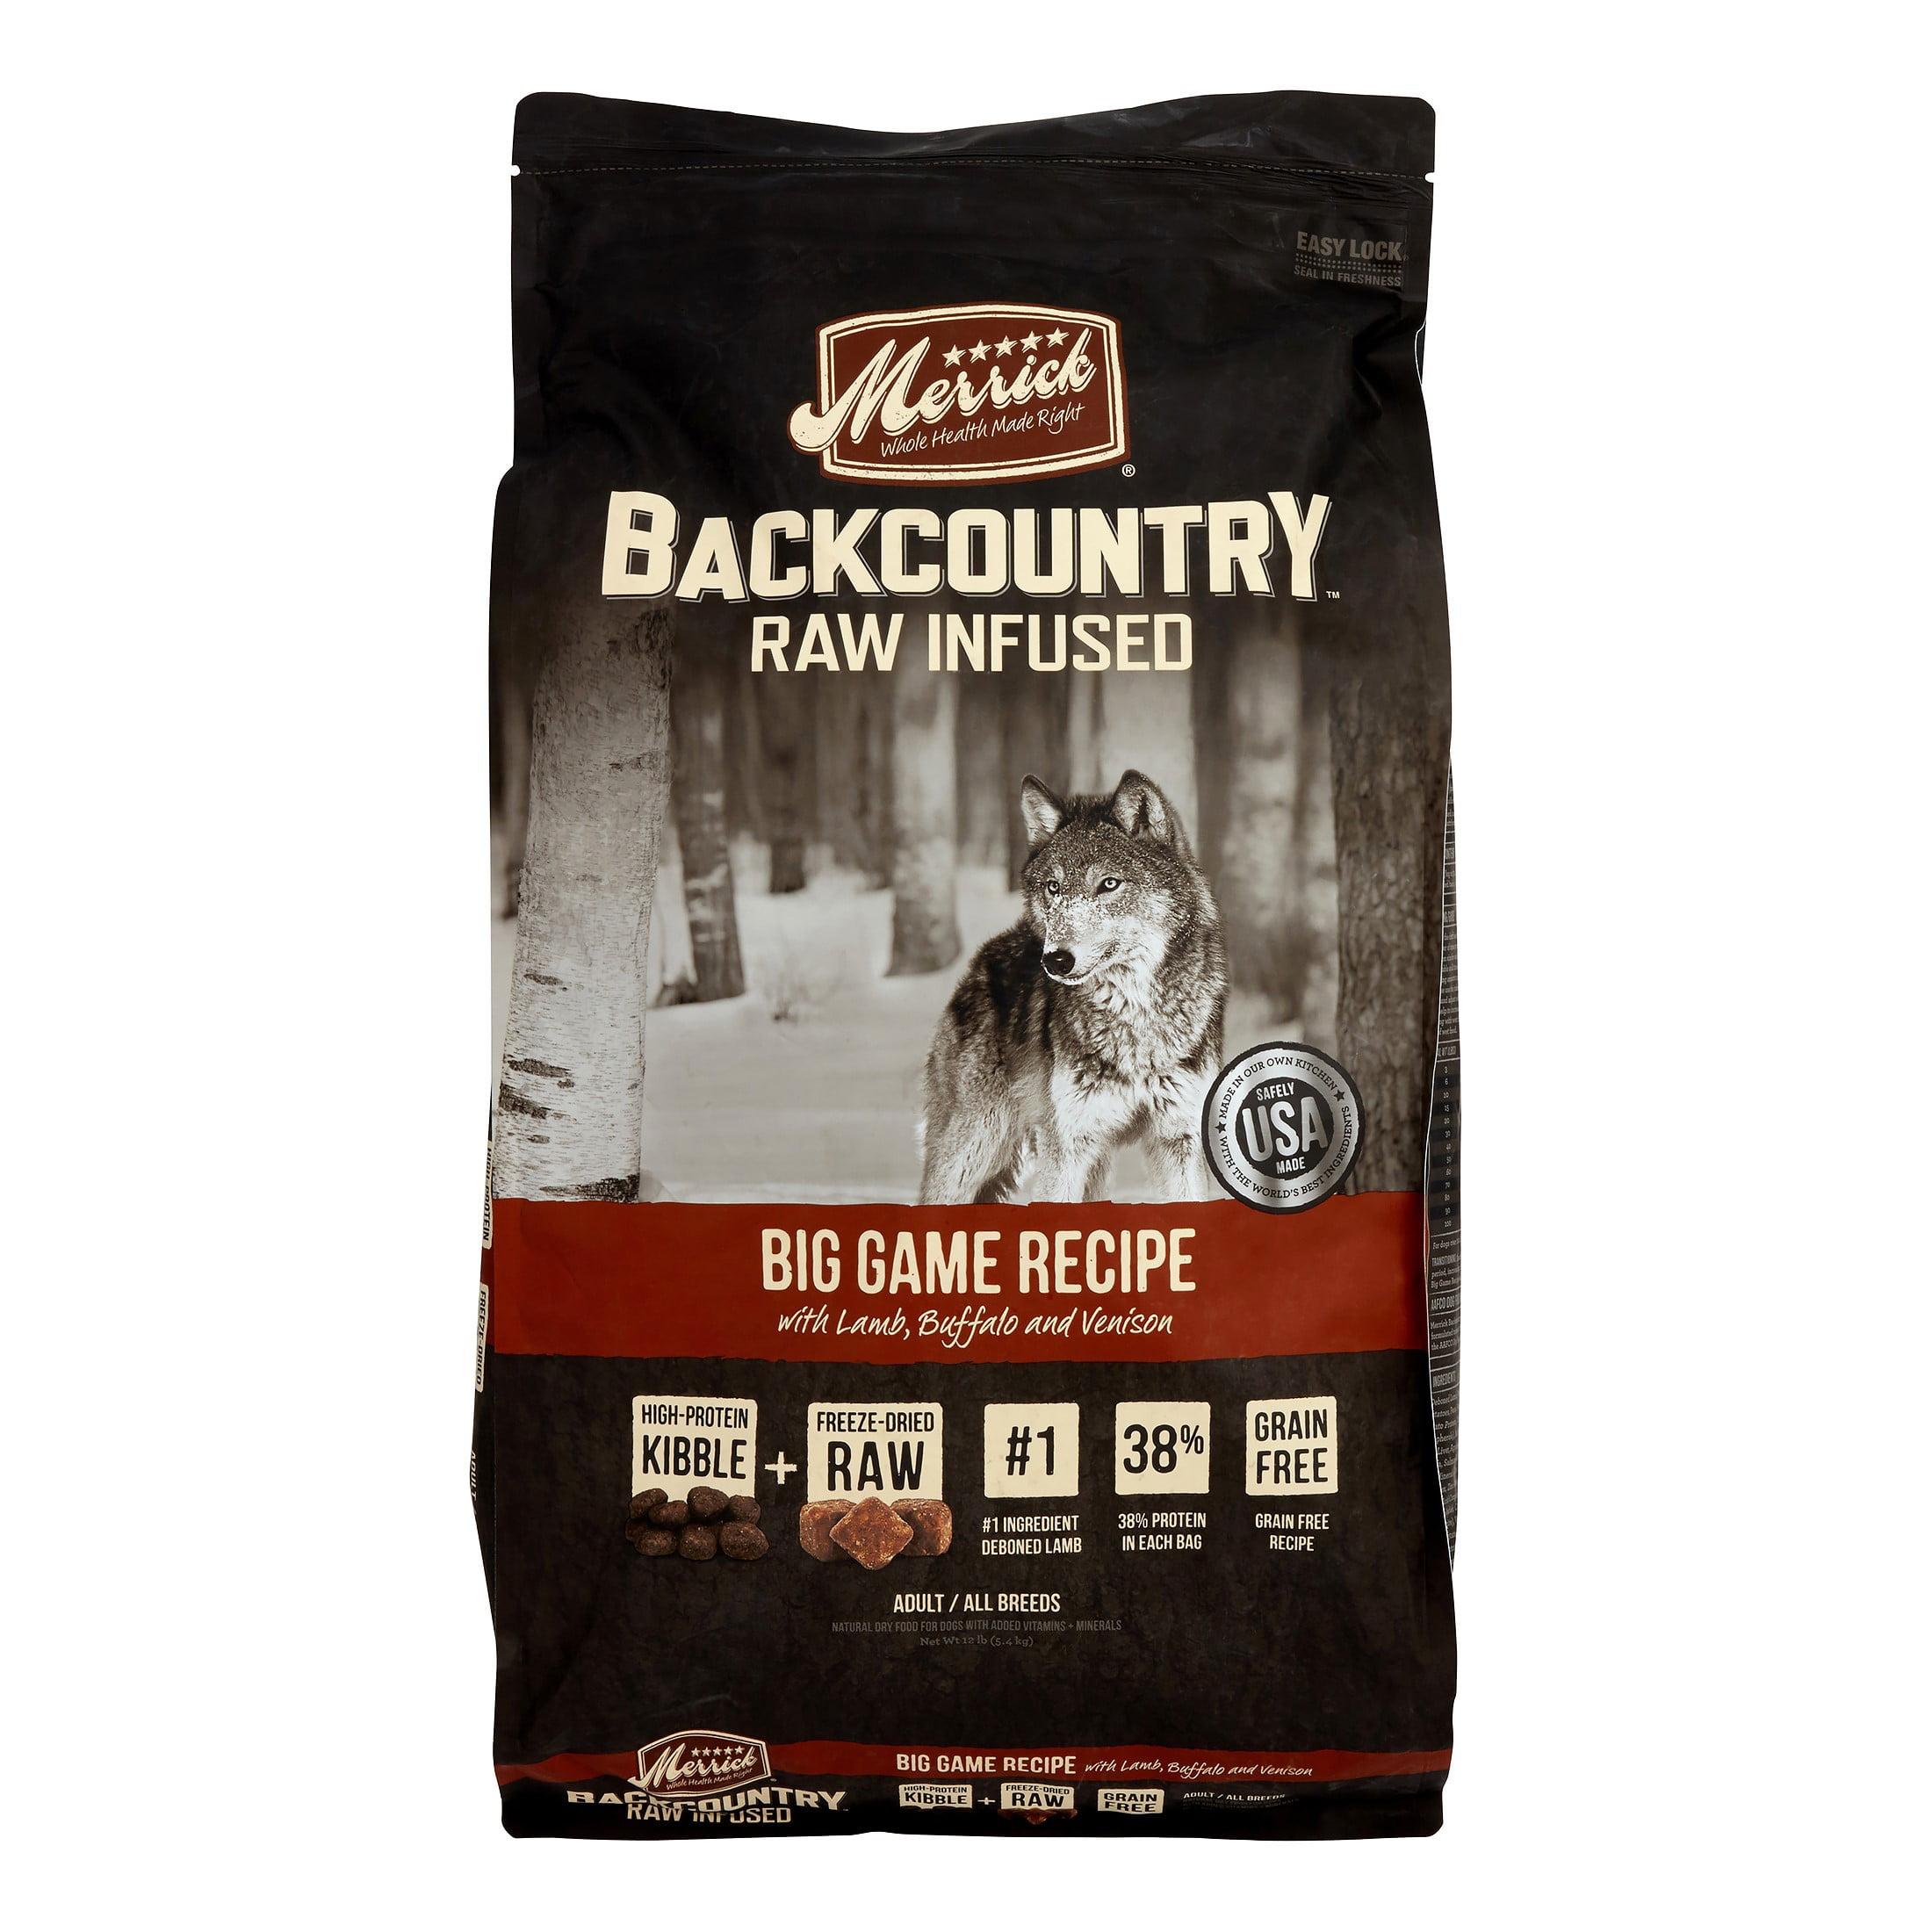 Merrick Backcountry Grain-Free Raw Infused Big Game Recipe Dry Dog Food, 12 lb